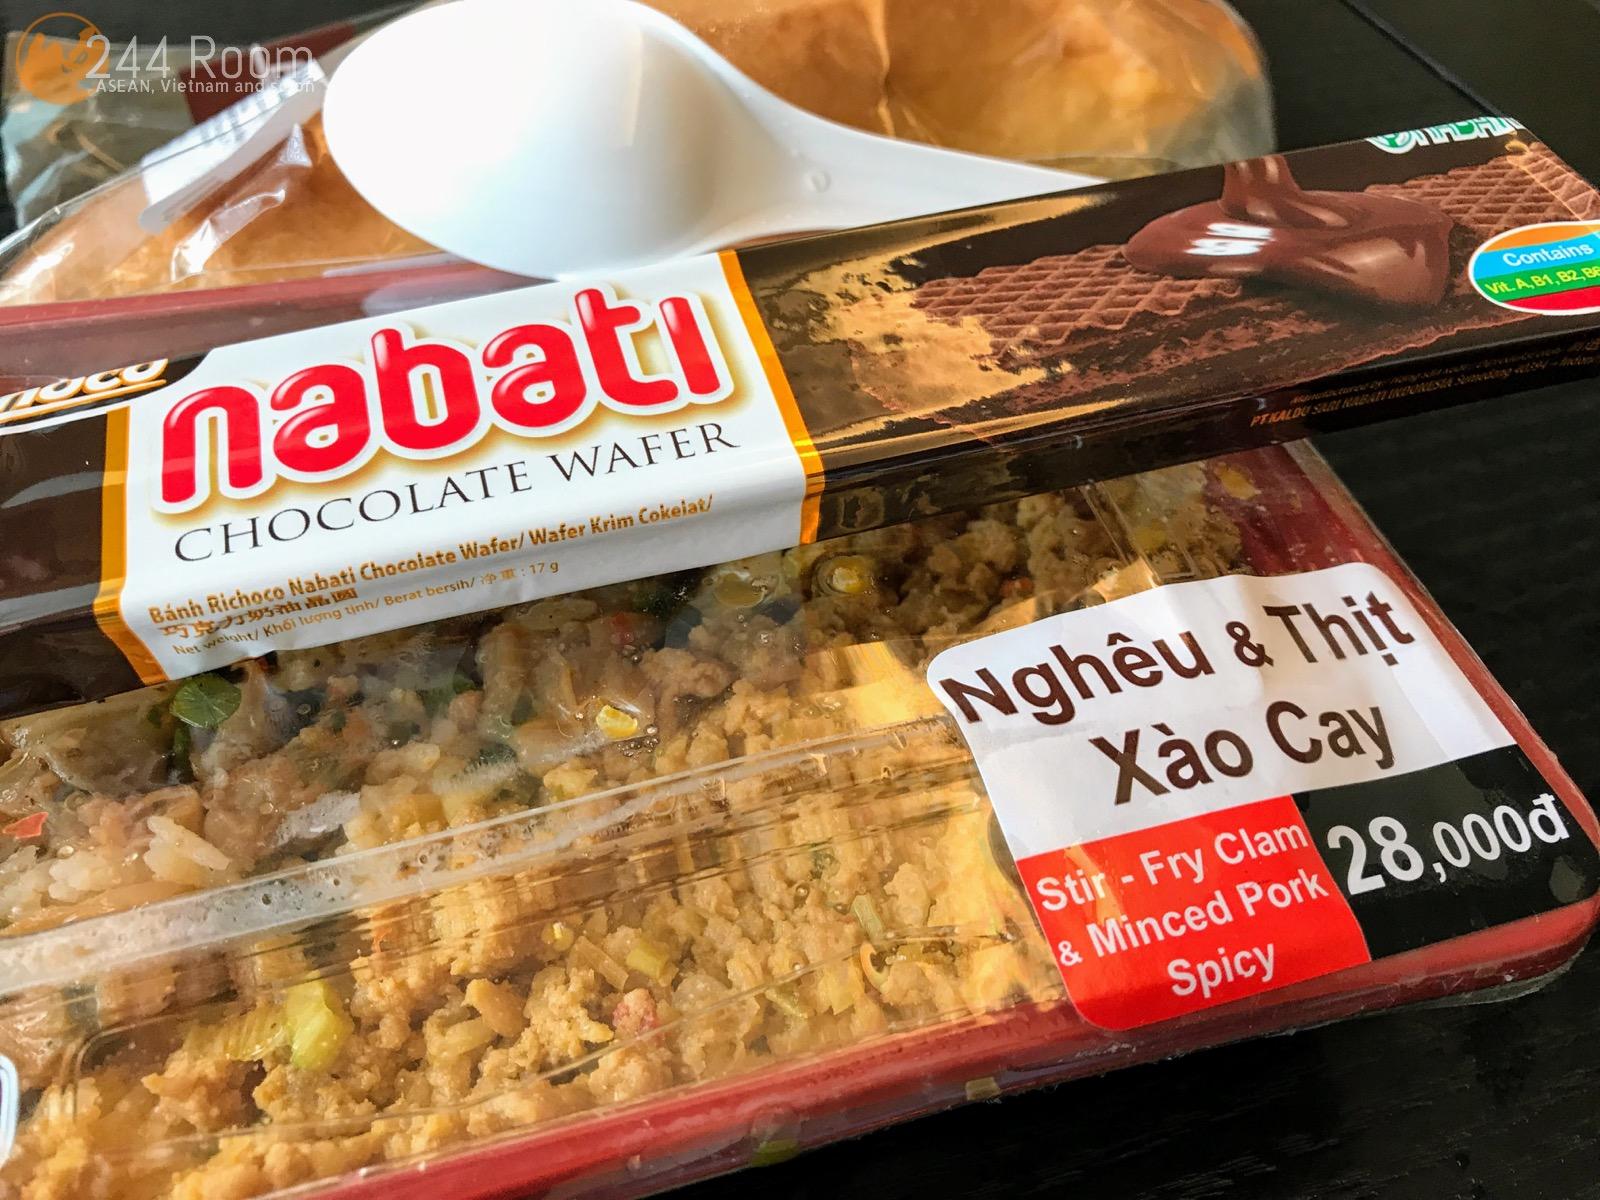 Vietnam familymart box lunch Bento